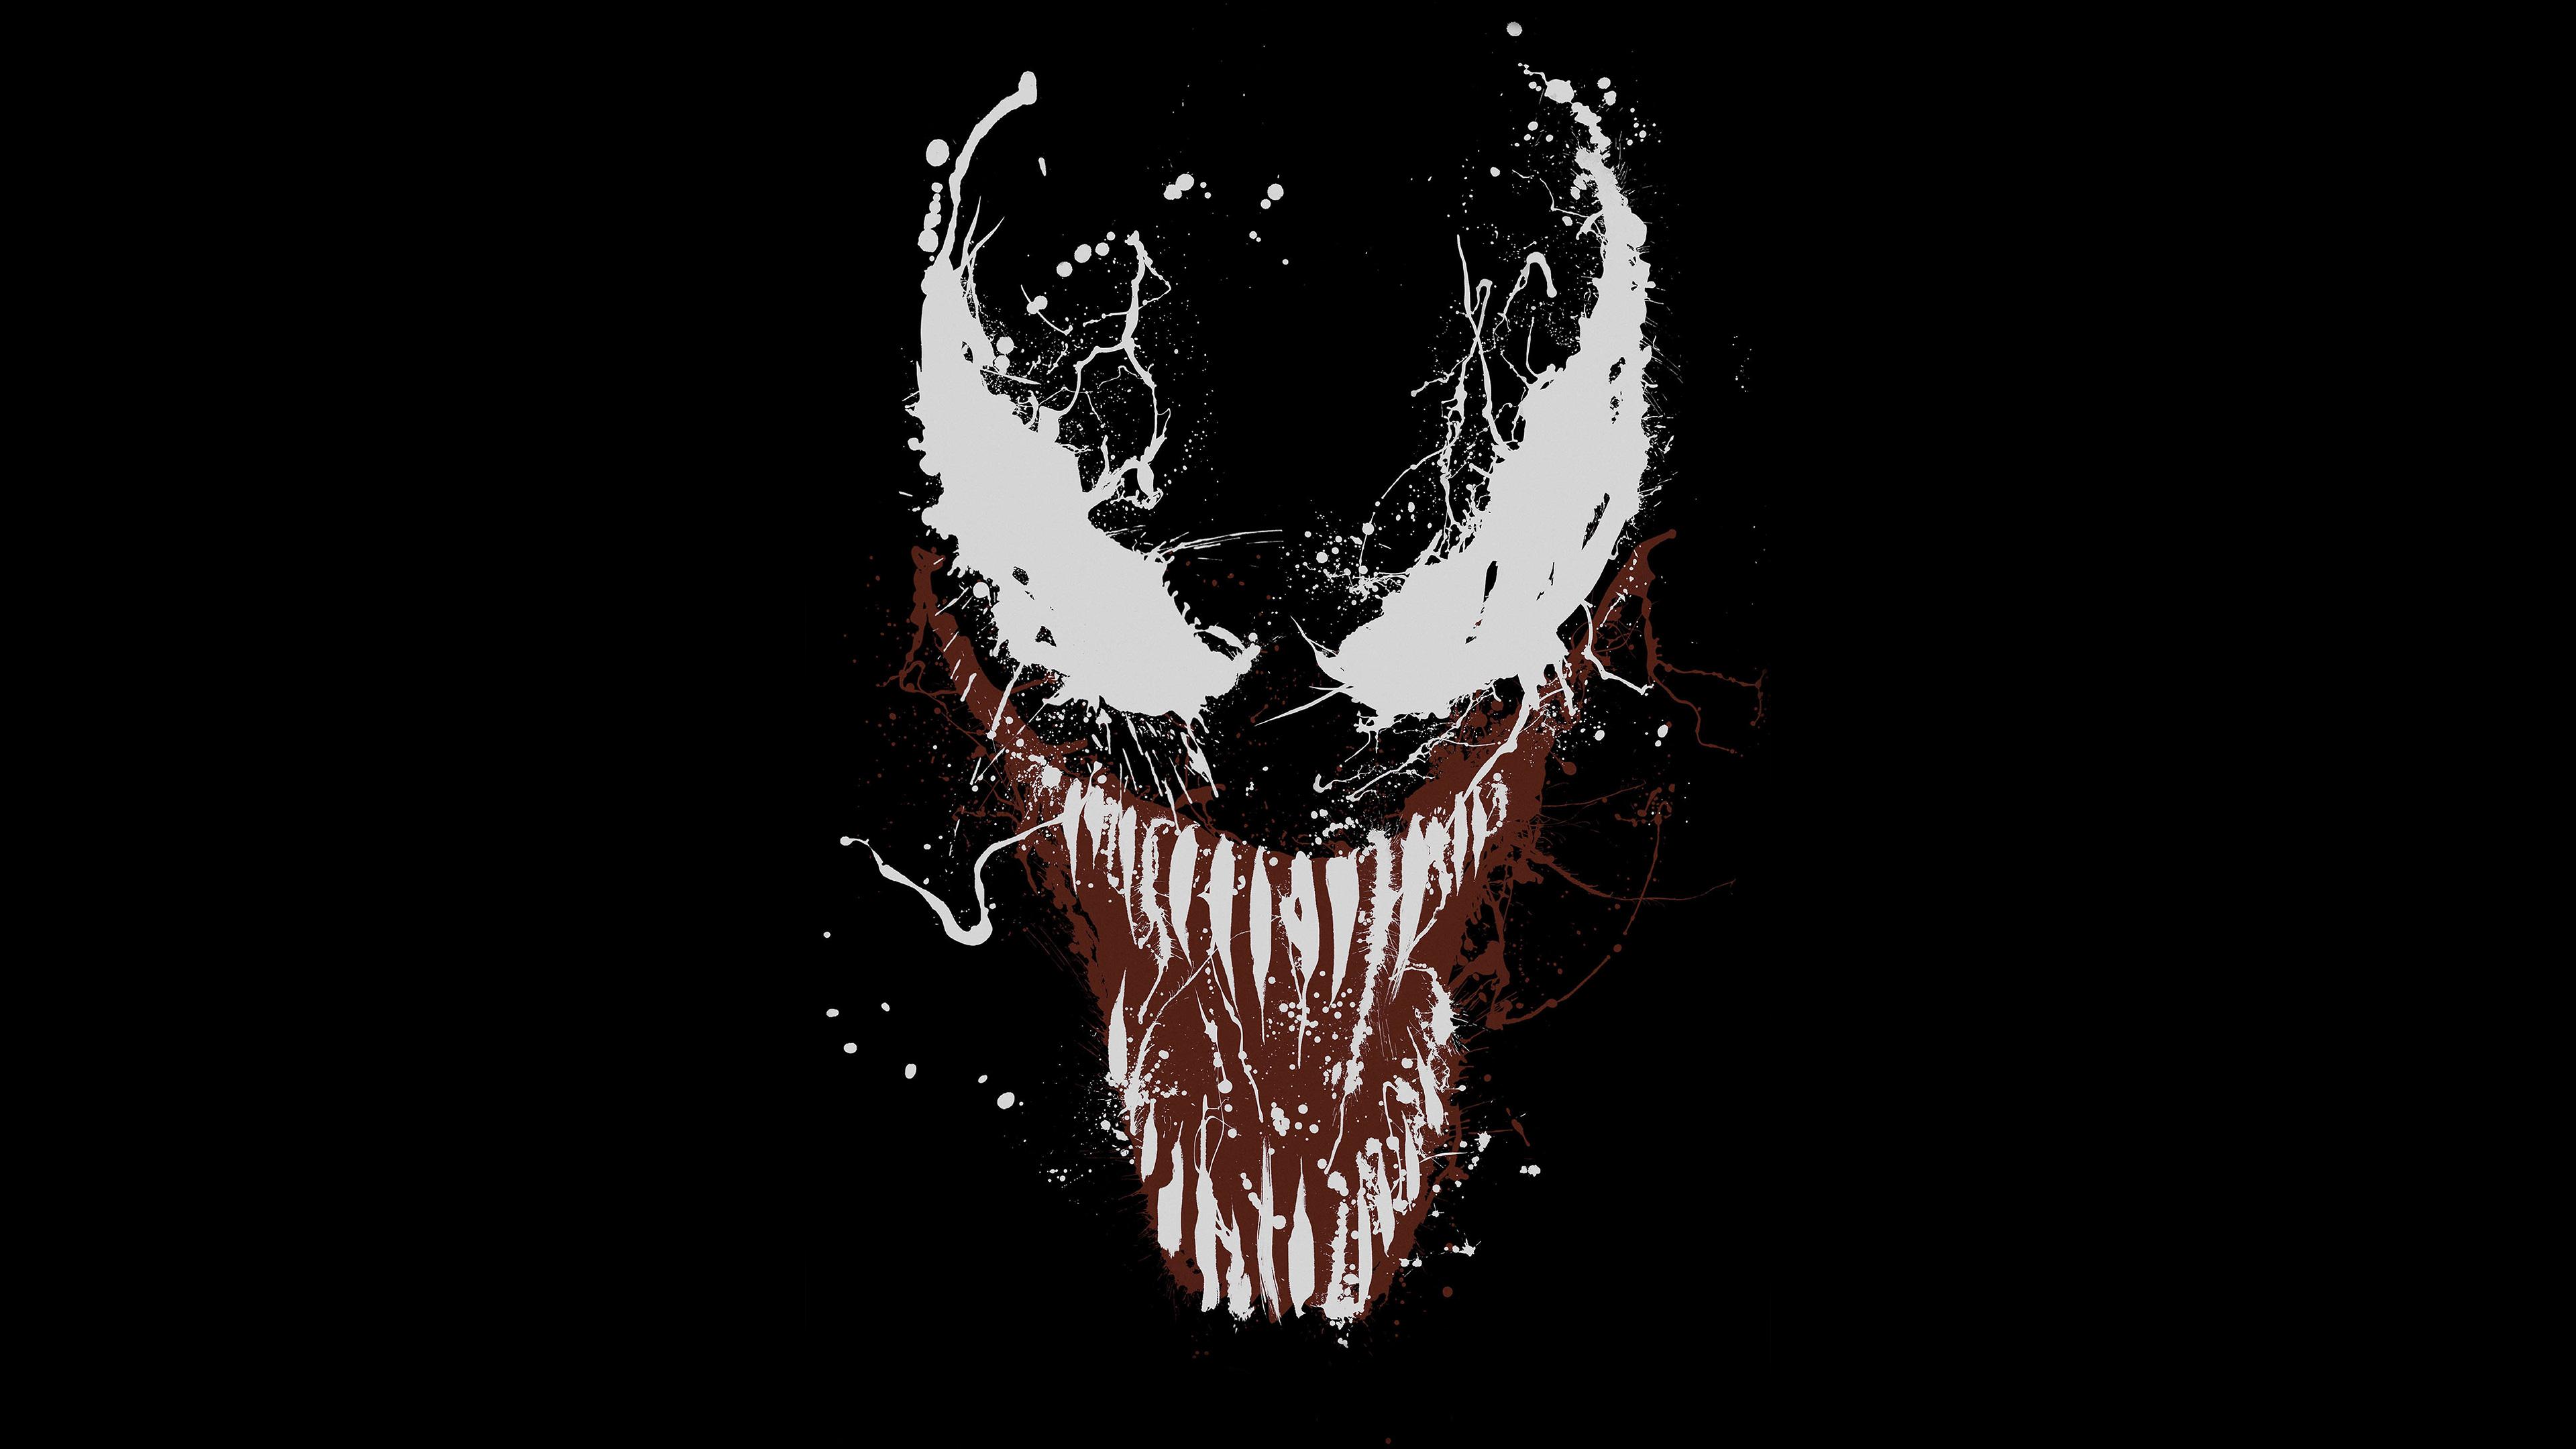 640x960 Venom Movie Poster 2018 iPhone 4, iPhone 4S HD 4k ...